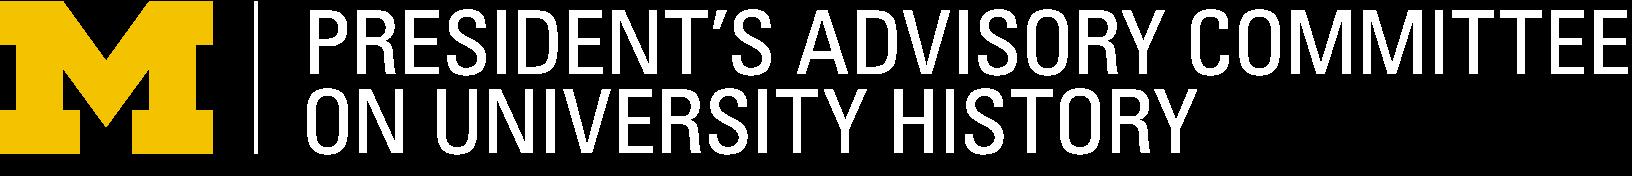 President's Advisory Committee on University History